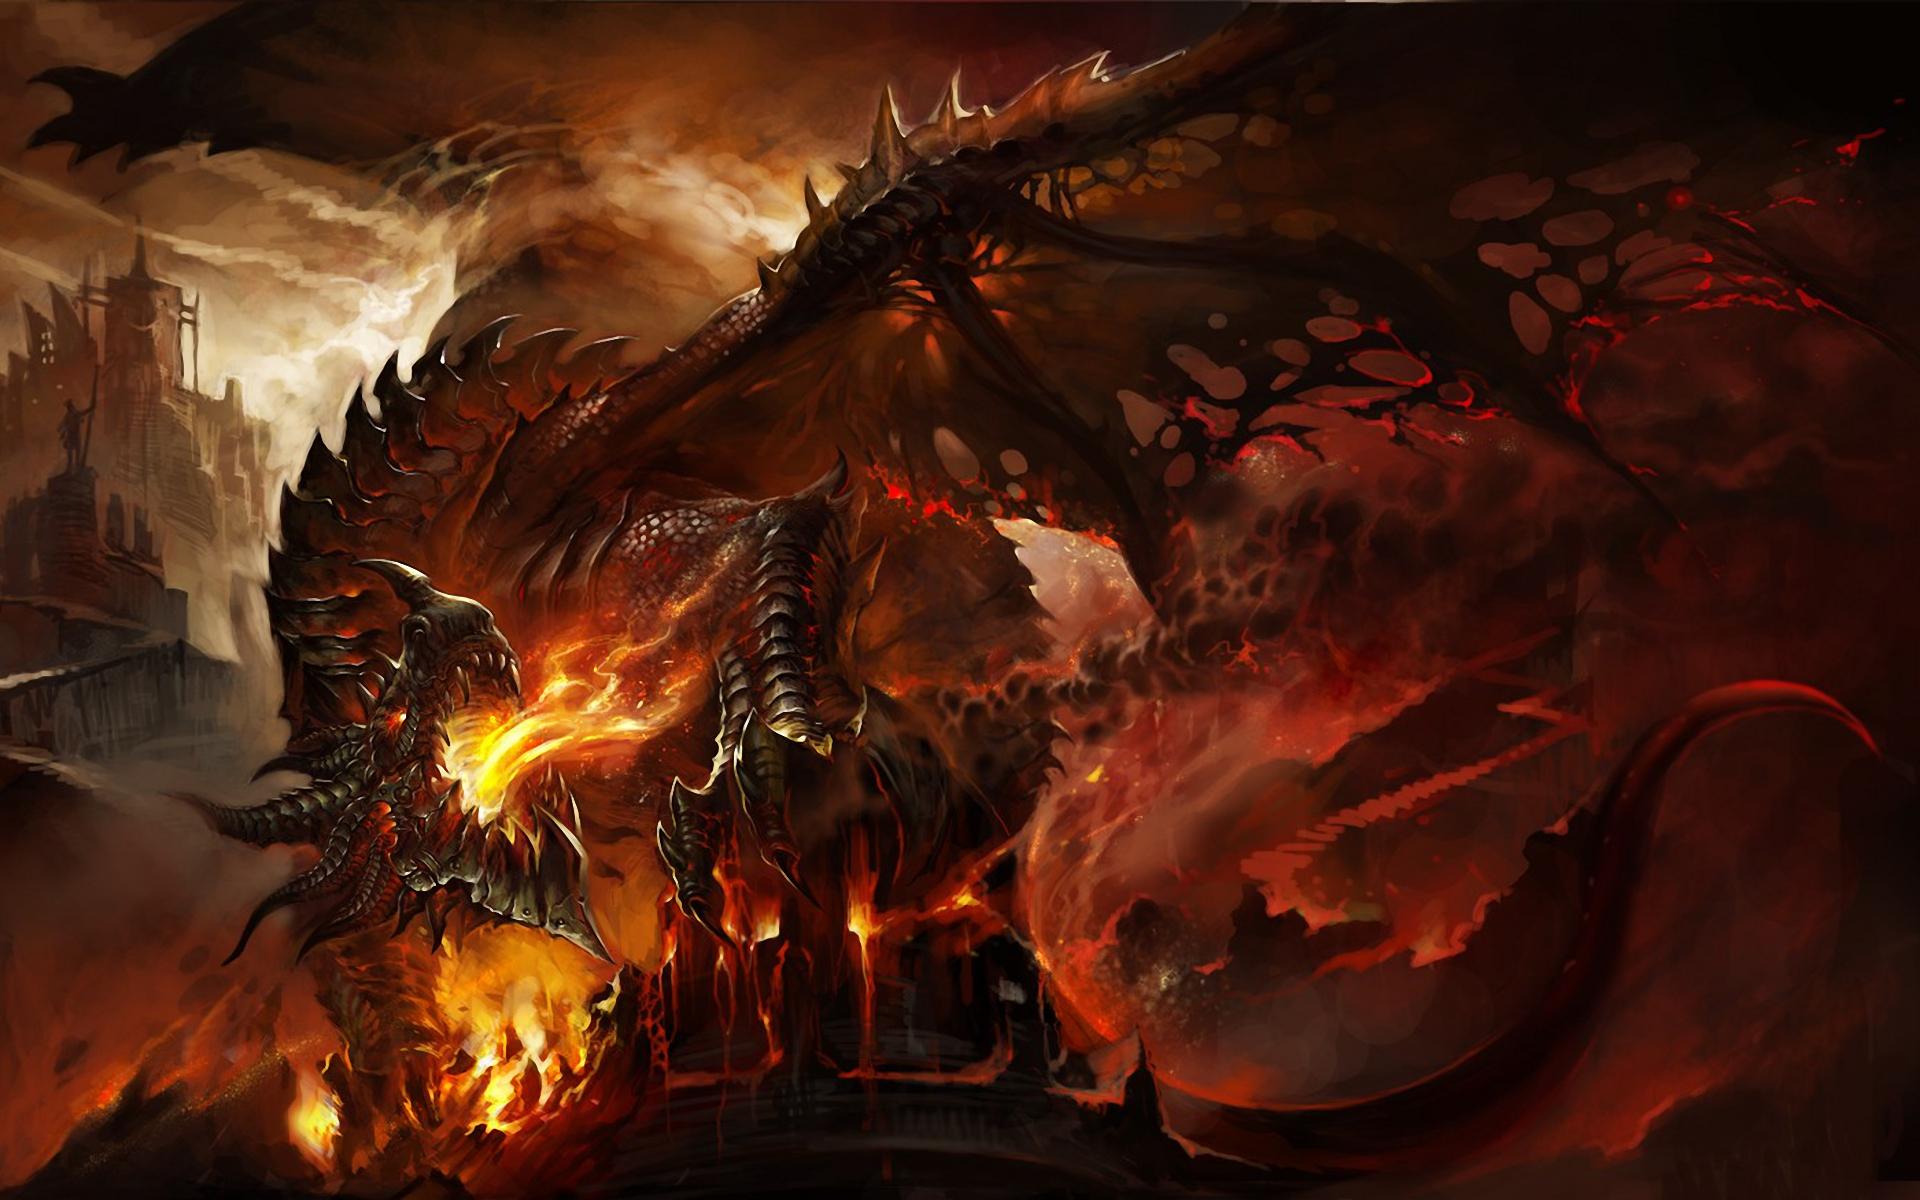 74 Epic Dragon Wallpaper On Wallpapersafari